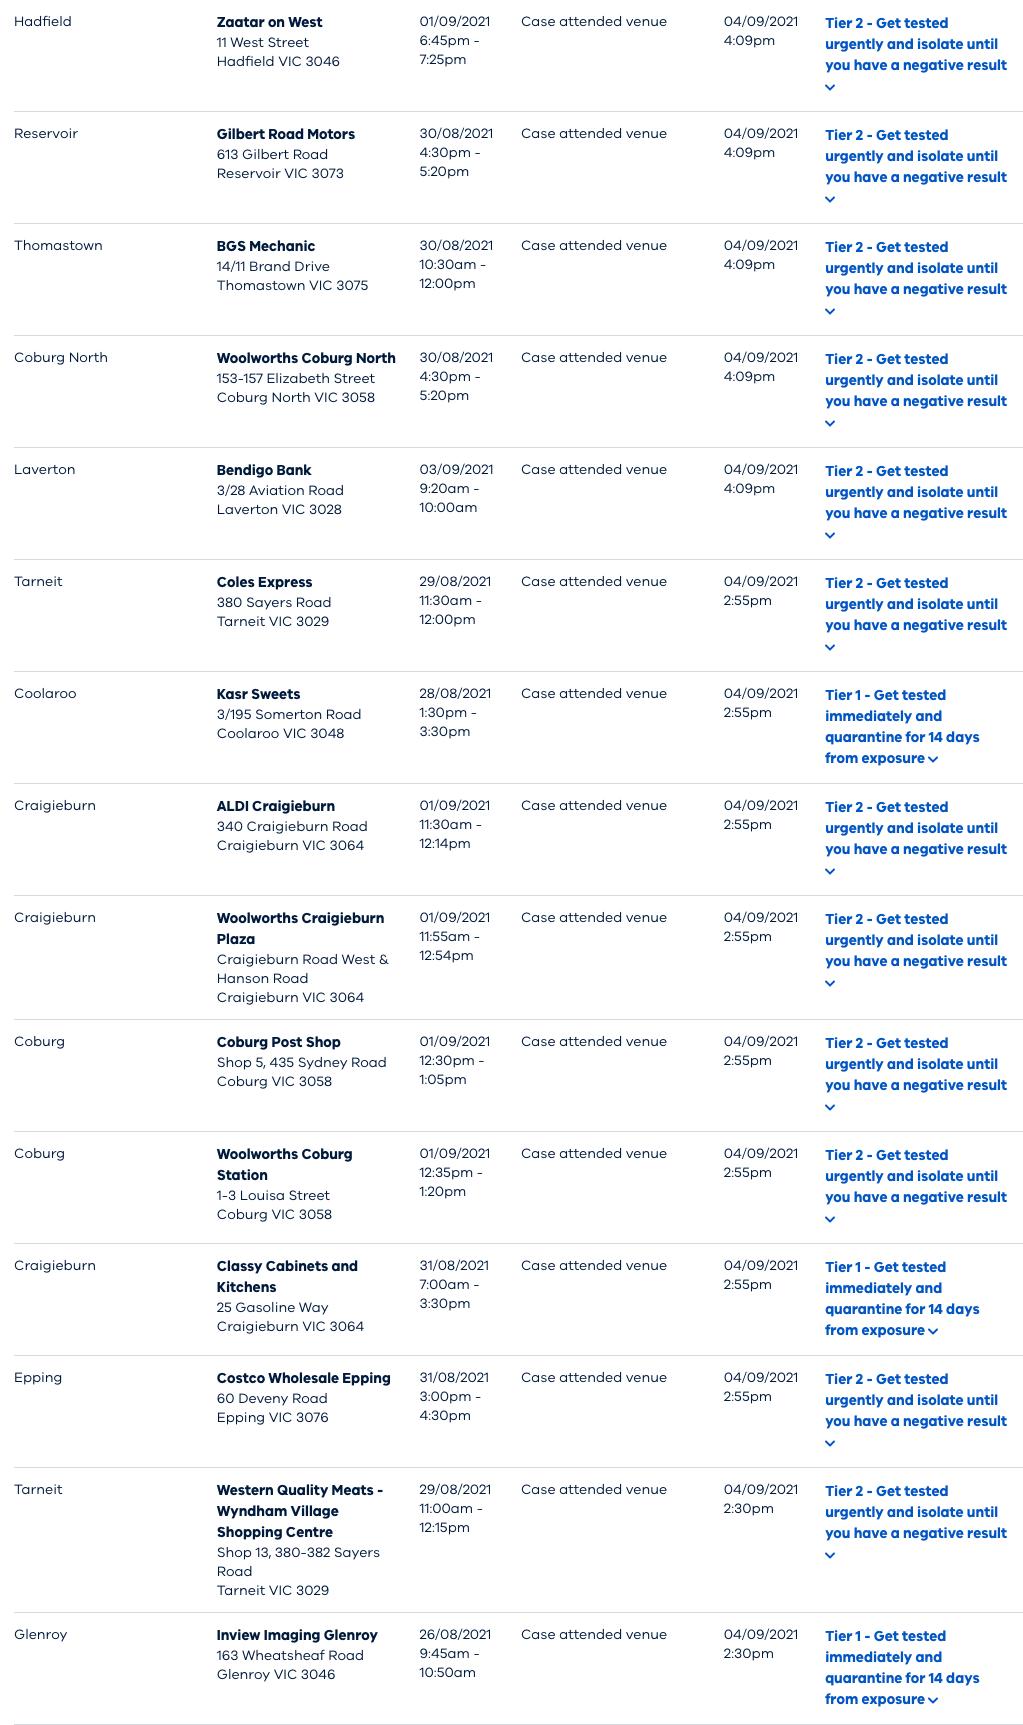 www.coronavirus.vic.gov.au_case-alerts%E2%80%93public-exposure-sites (5).png